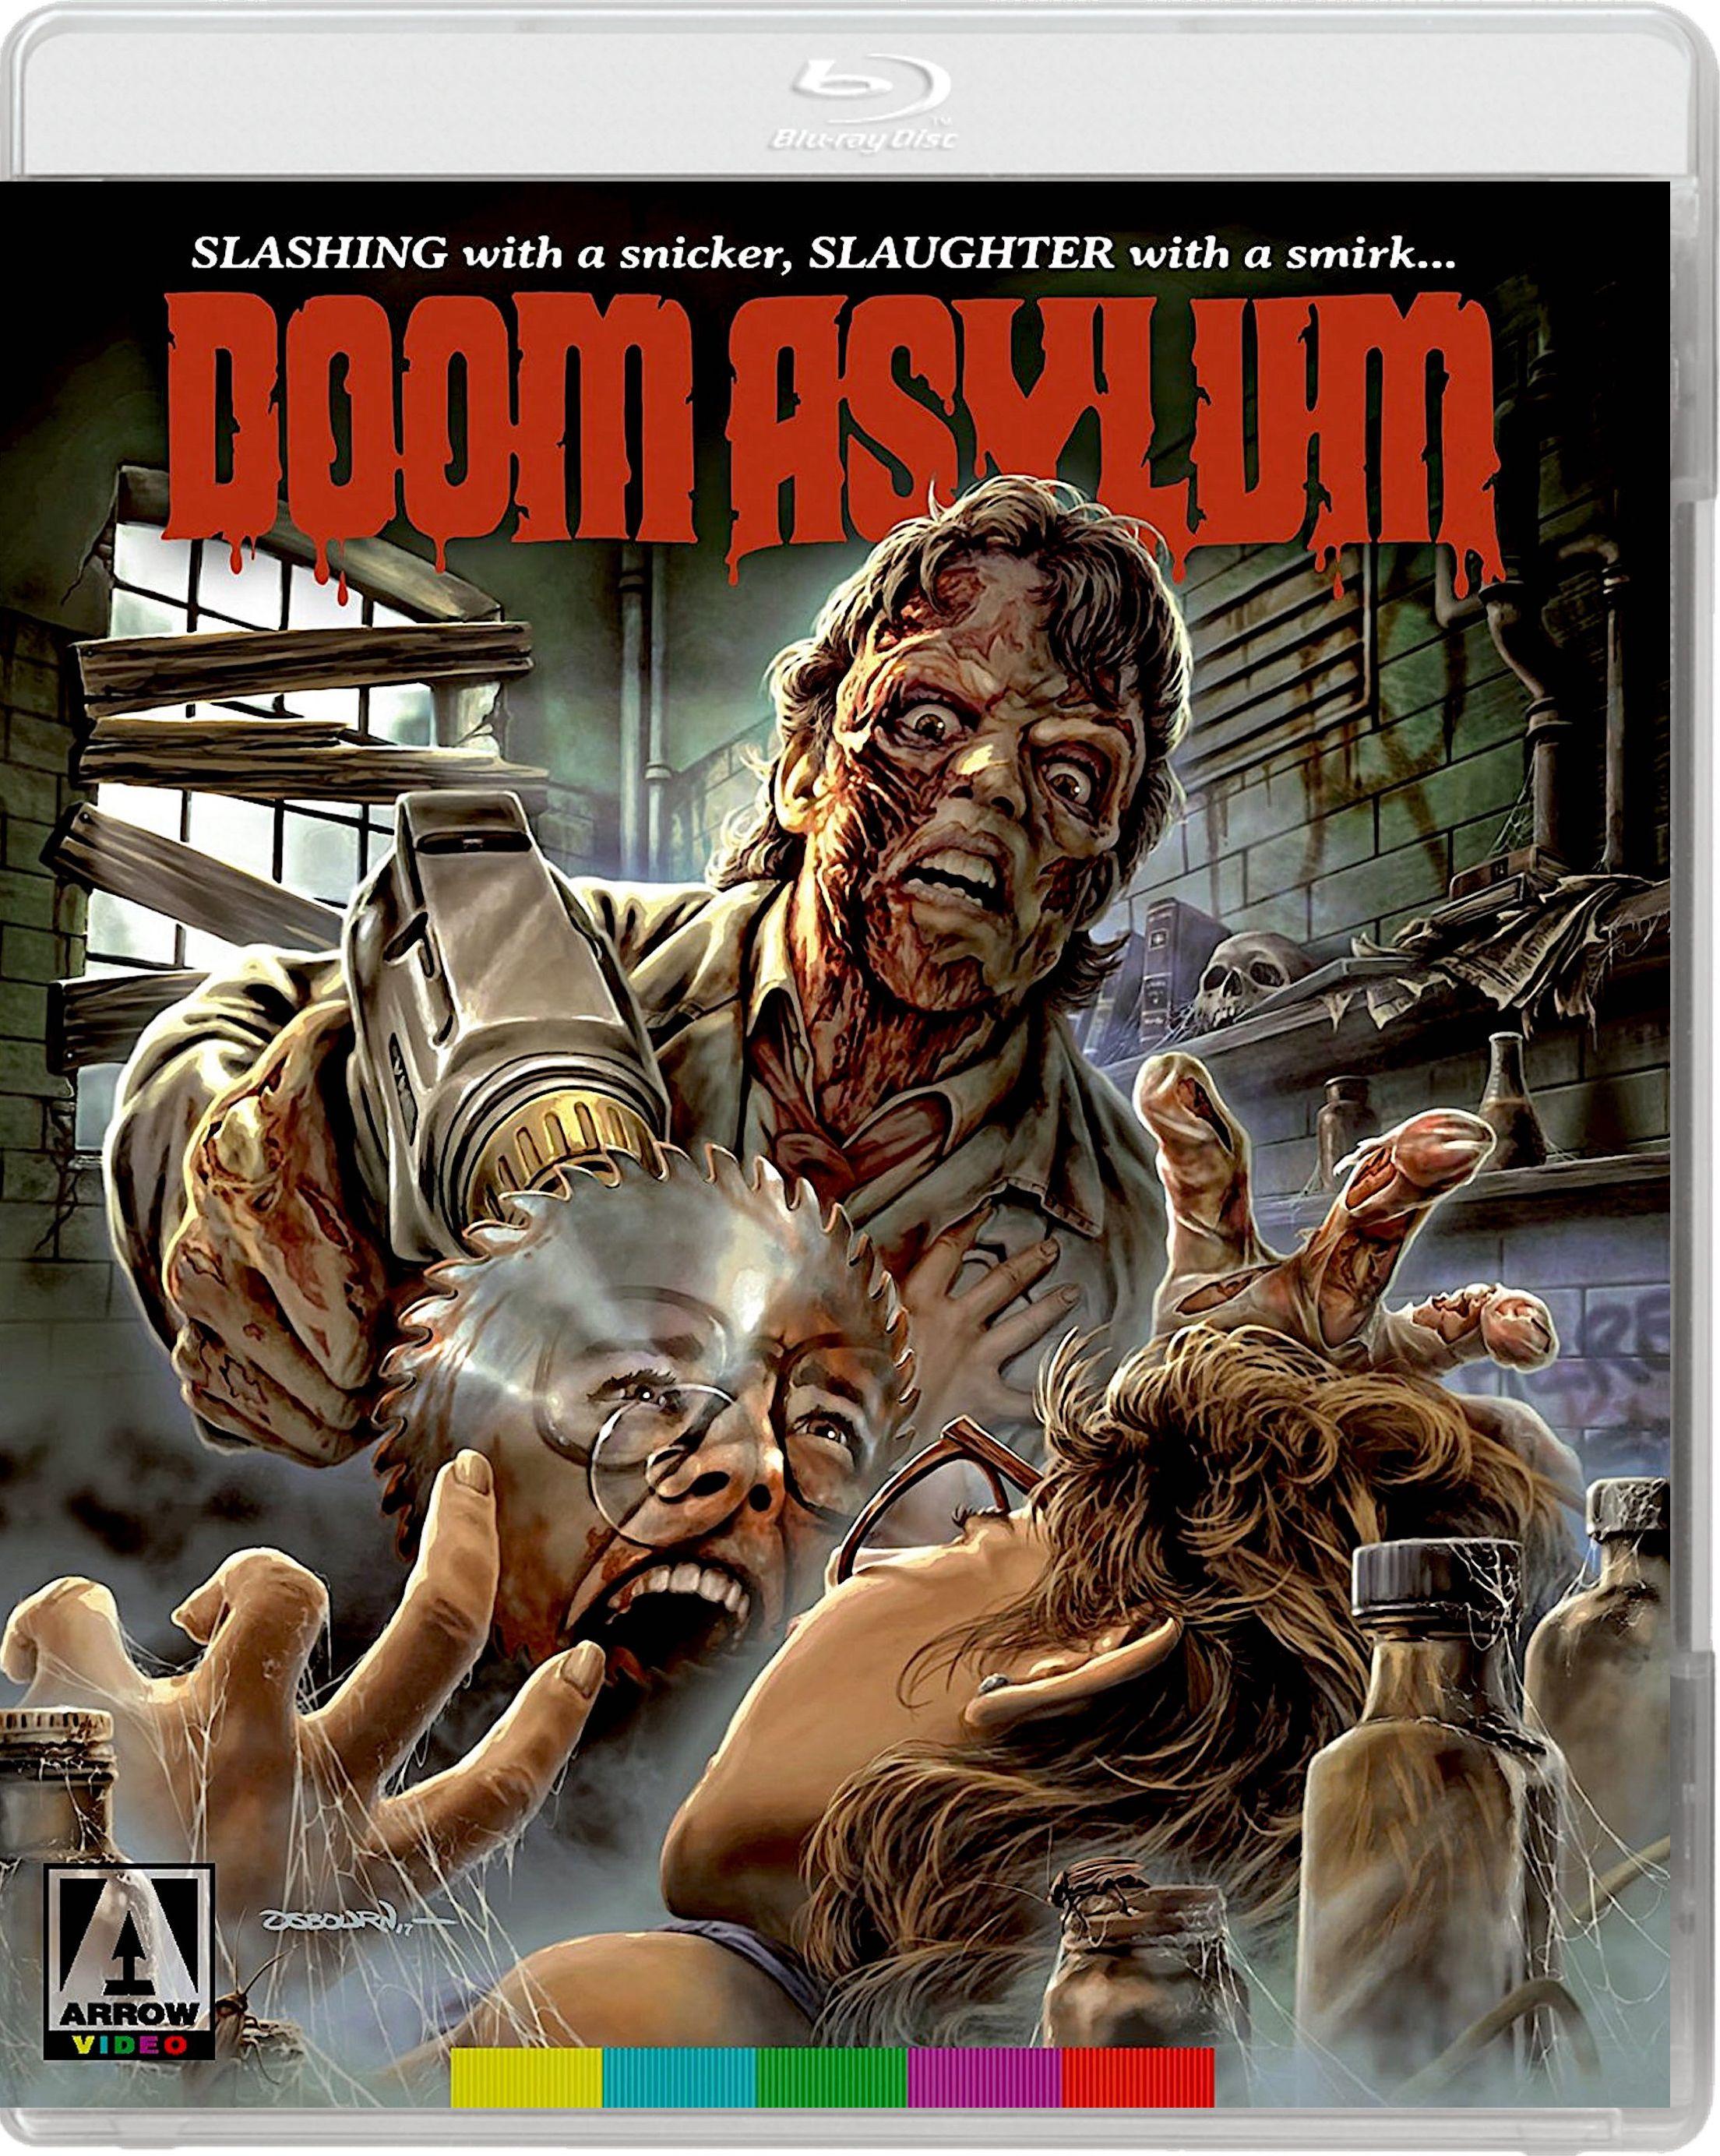 DOOM ASYLUM BLURAY (ARROW US) Horror movie posters